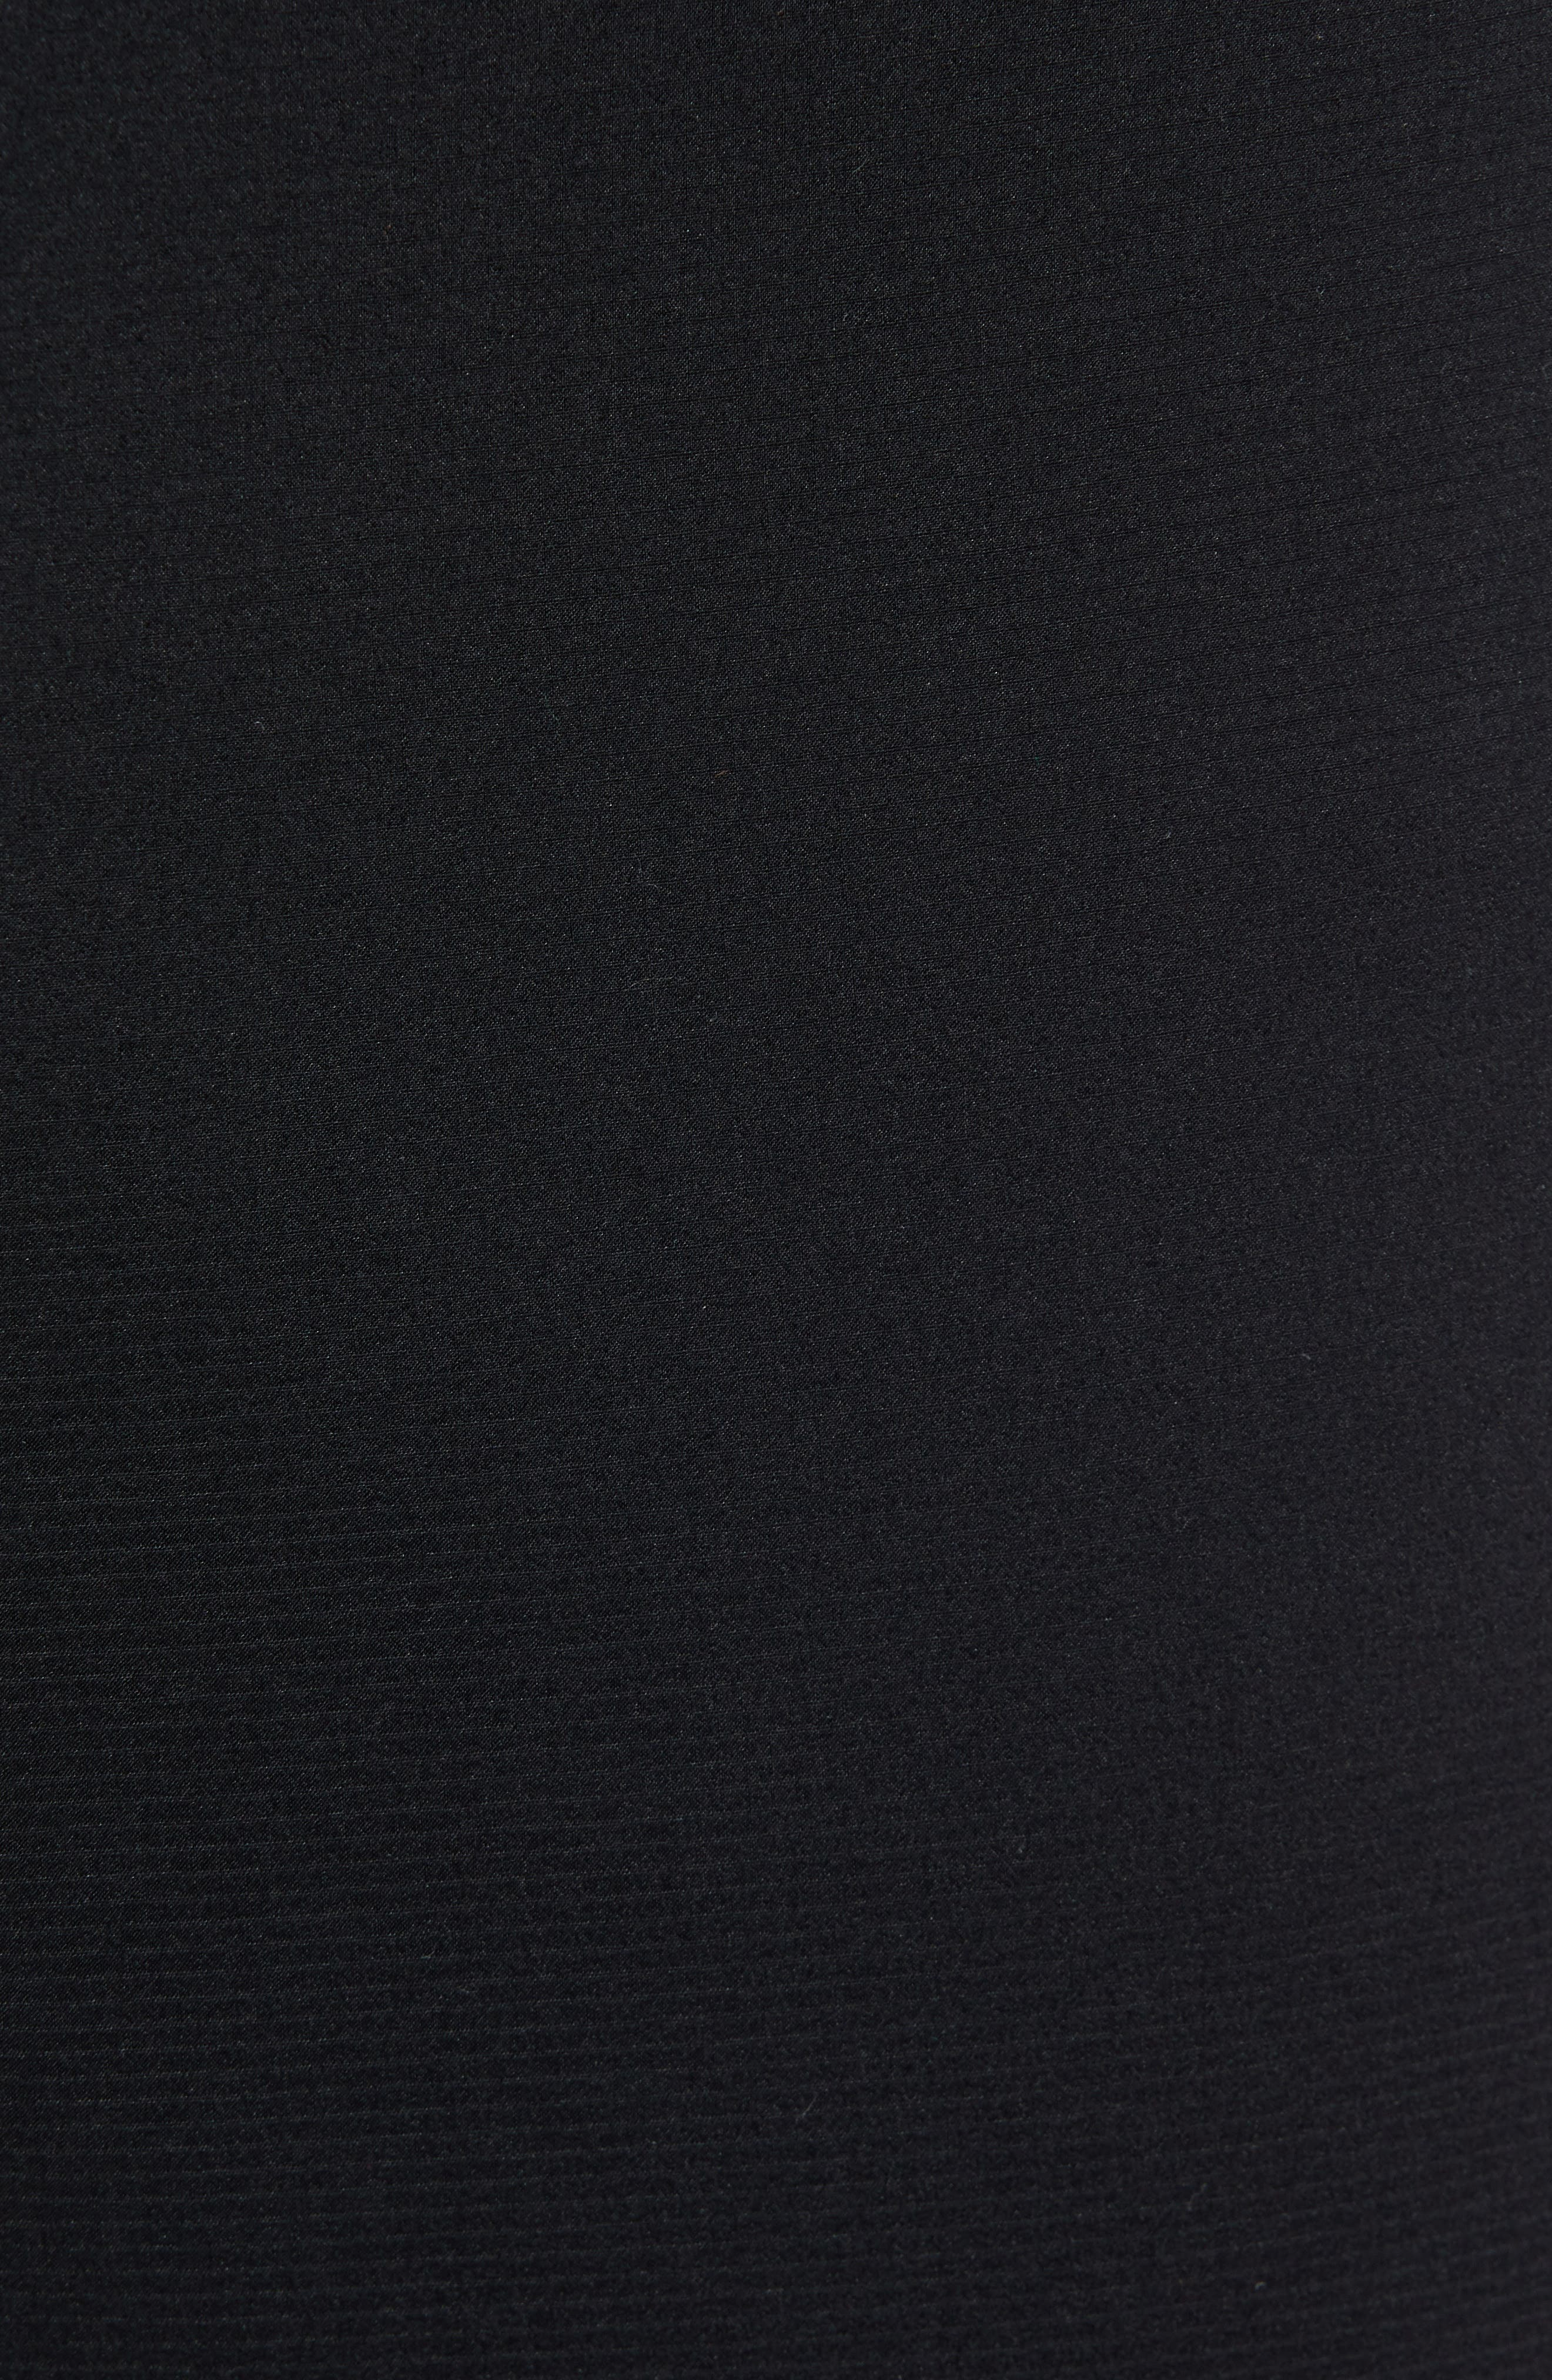 Tech Trainer Hybrid Sport Pants,                             Alternate thumbnail 5, color,                             BLACK